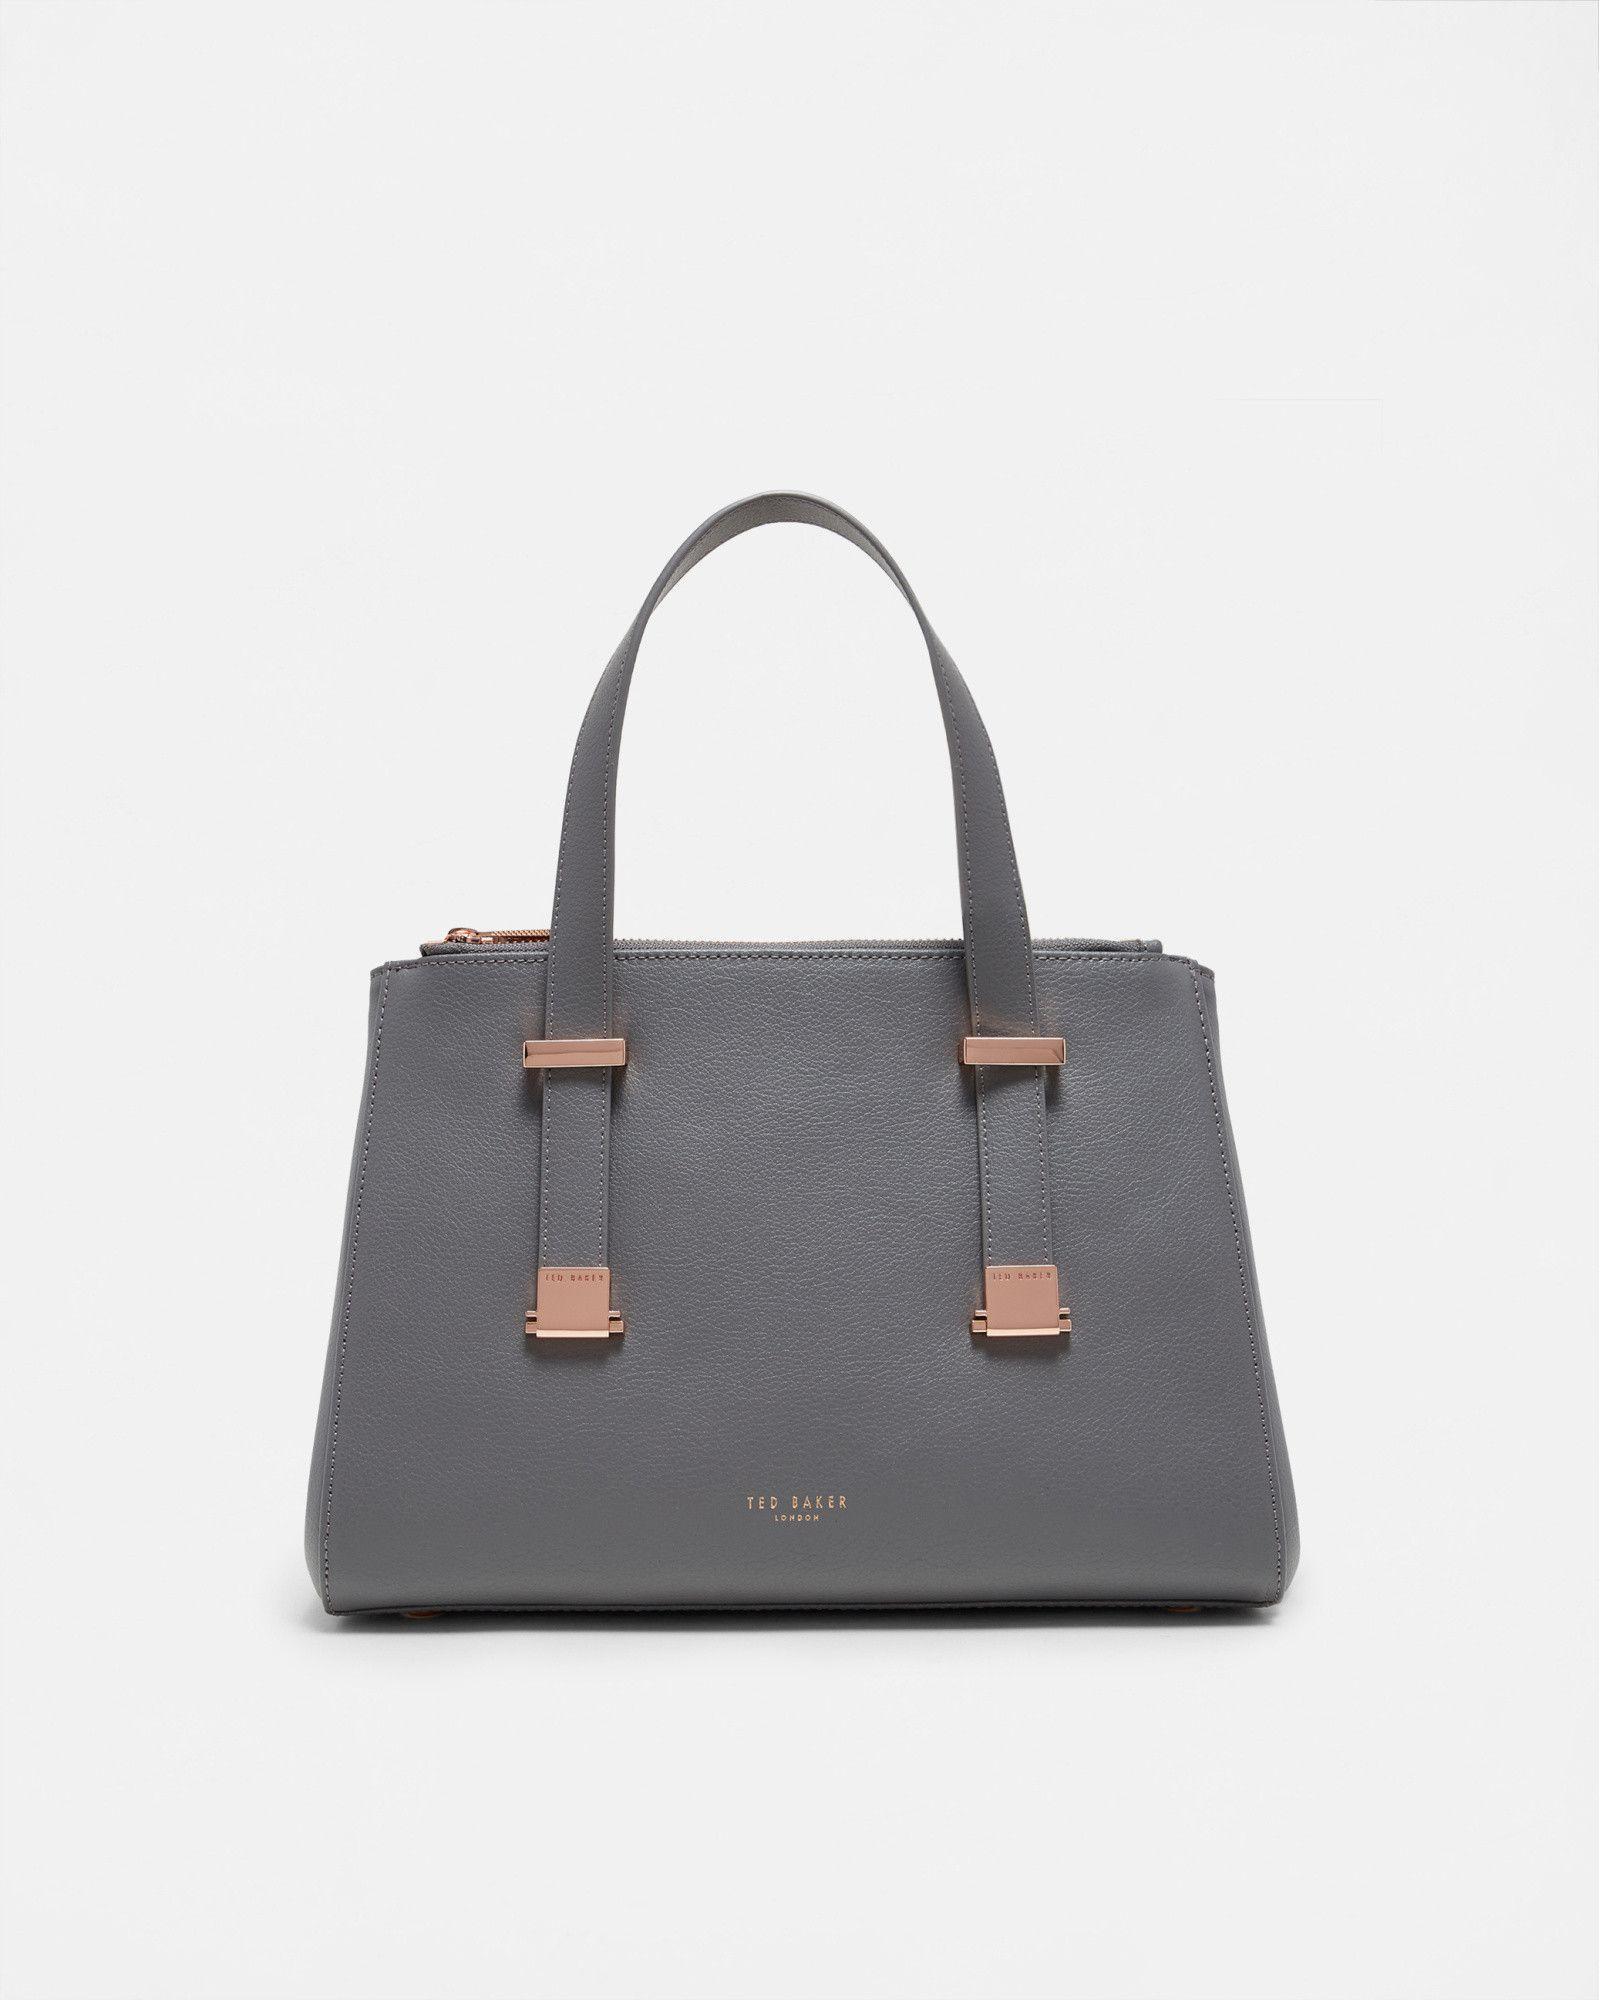 7dae0c81b Small leather pebble grain tote bag - Mid Gray